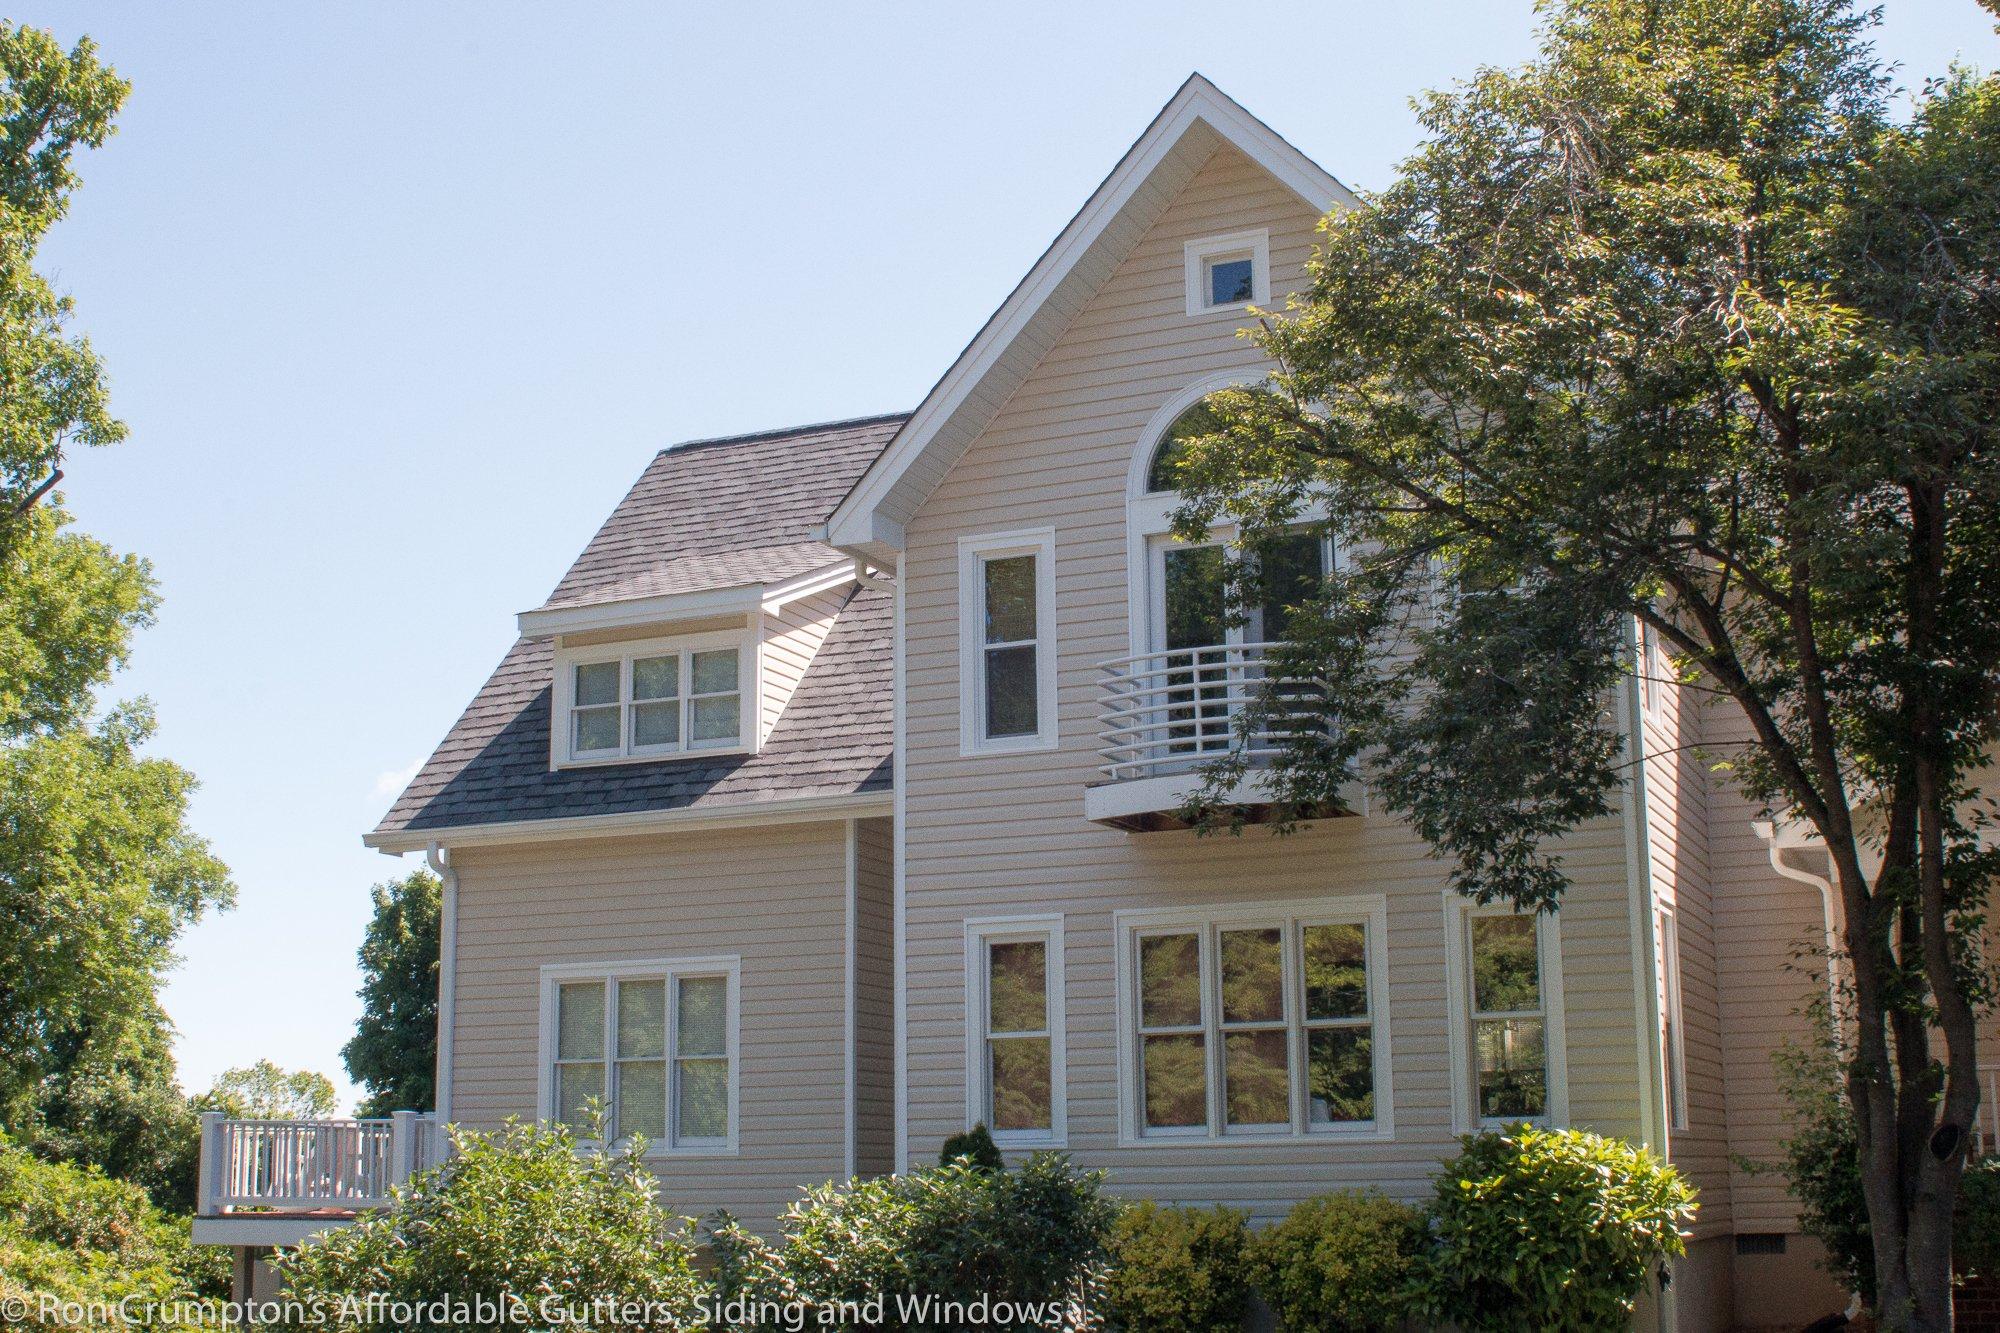 Richmond Siding Windows and Gutters-3